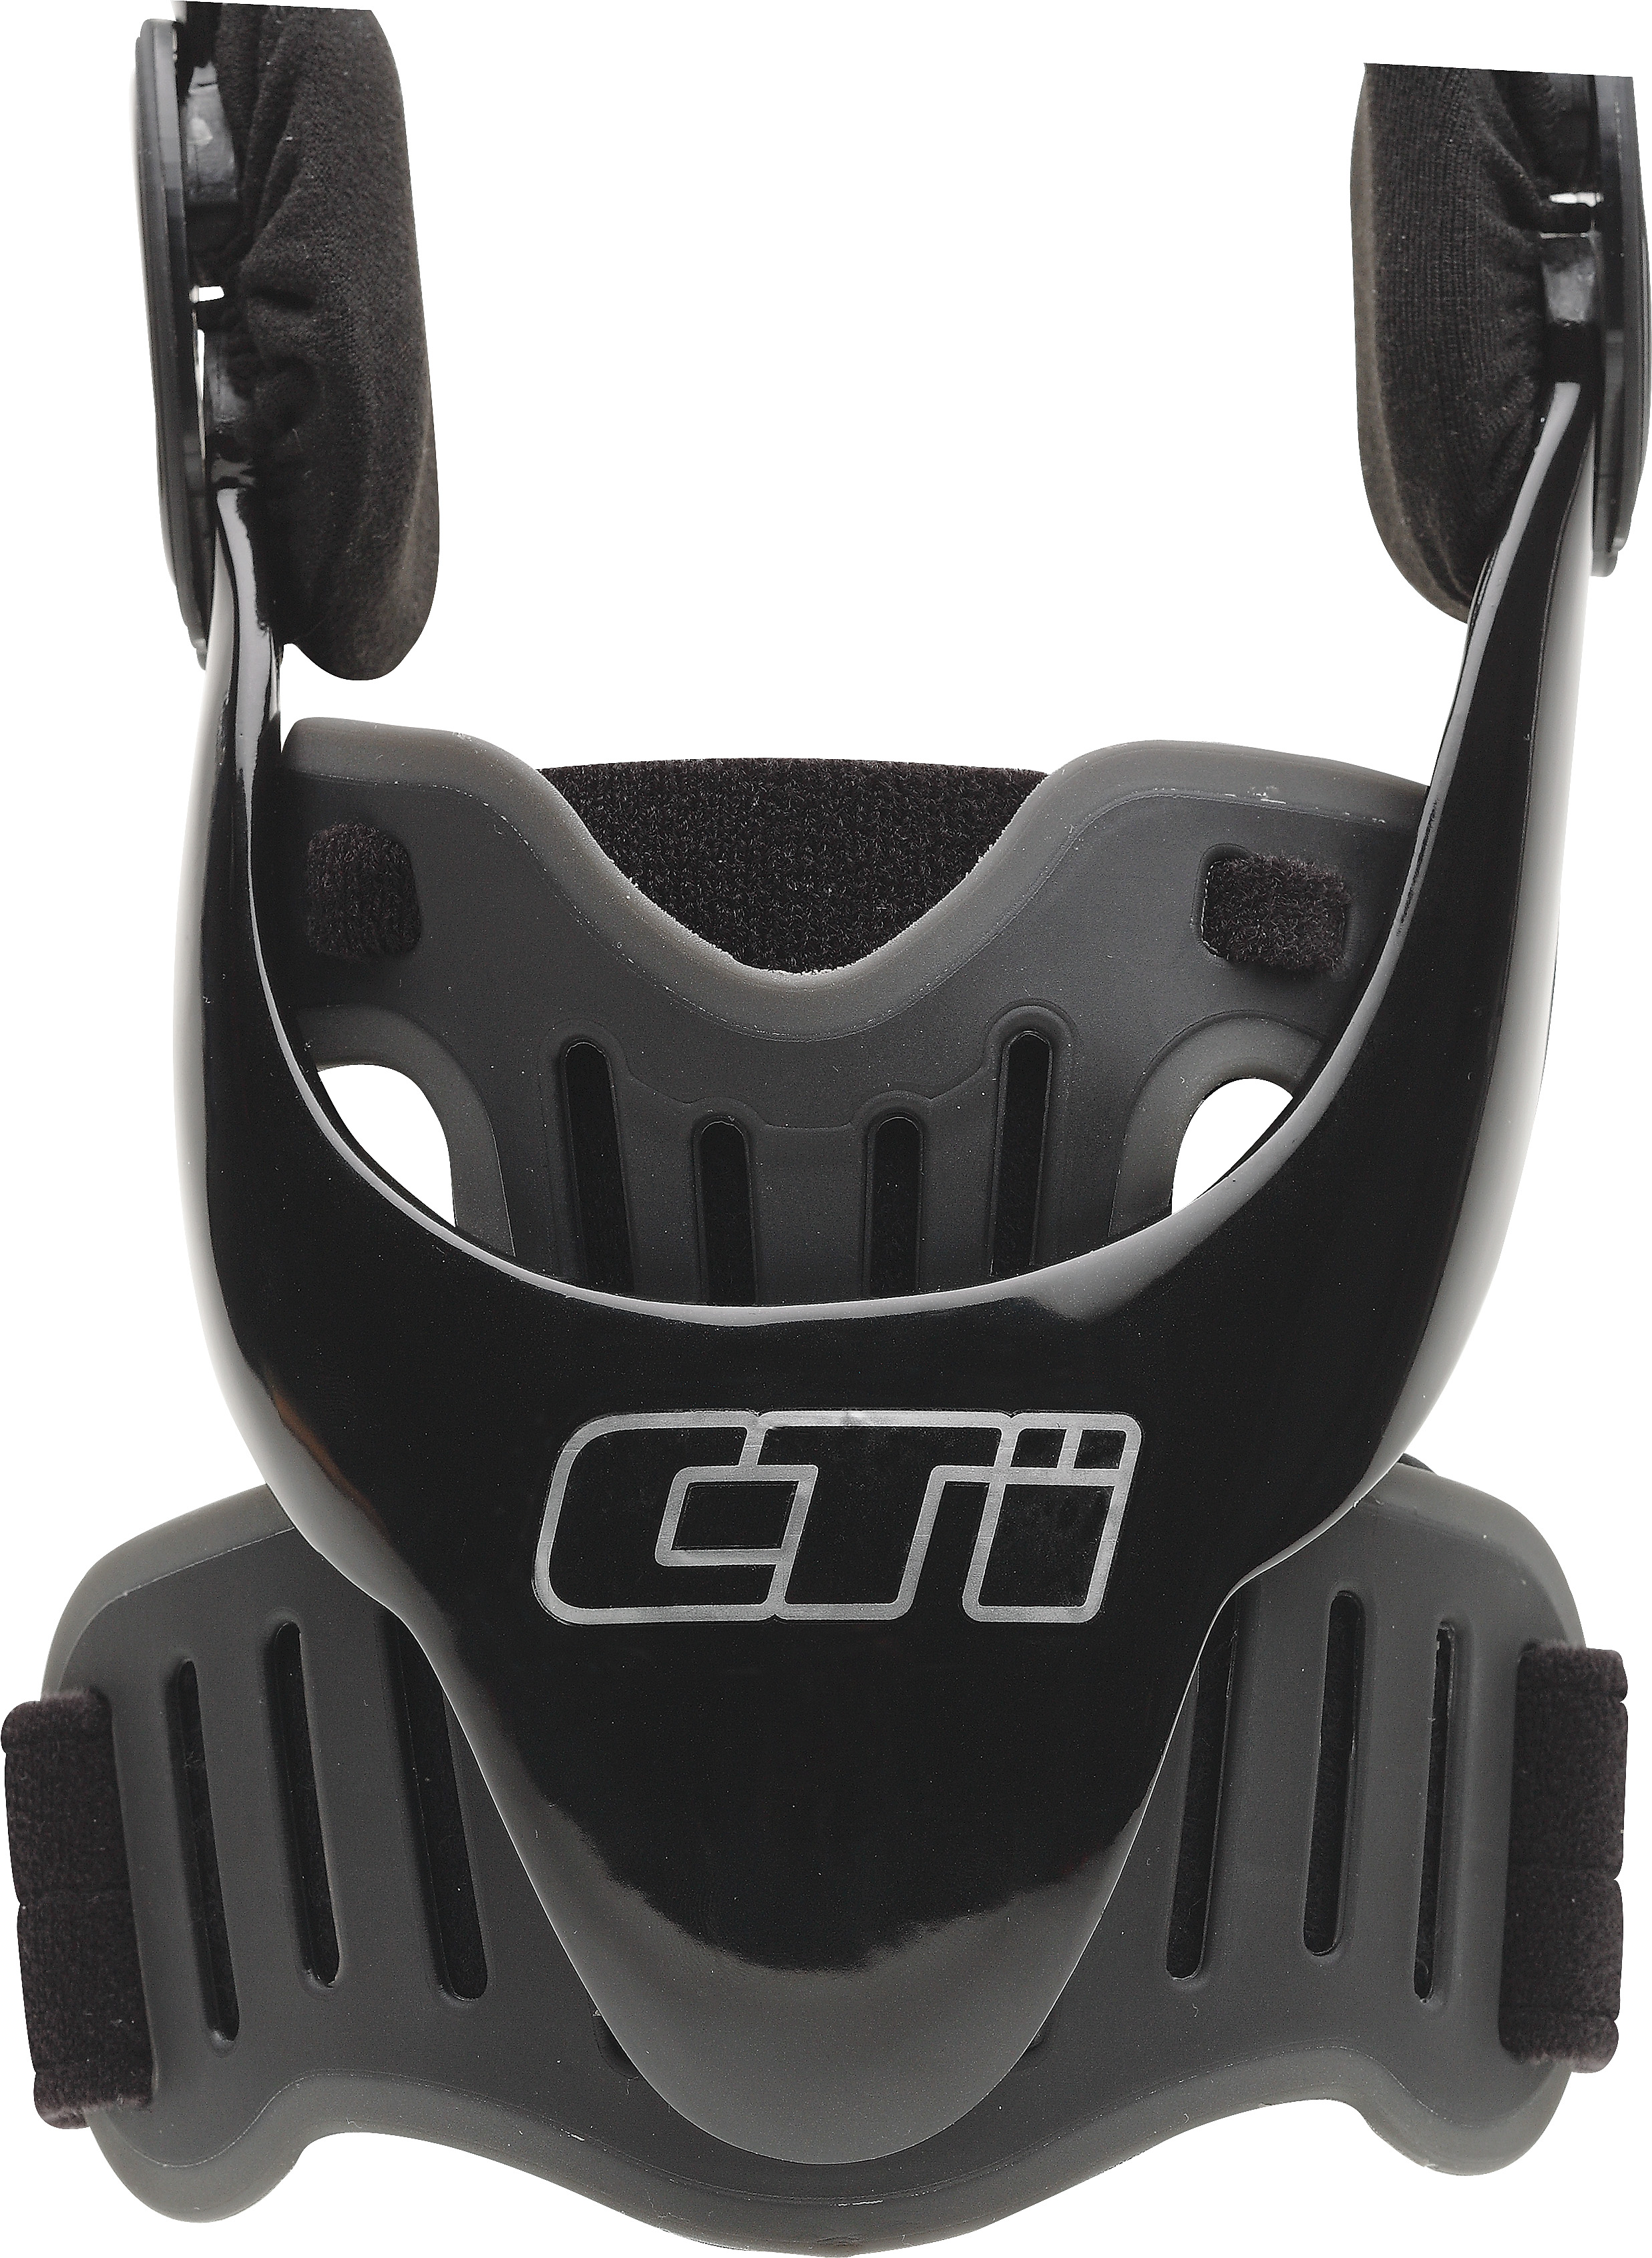 cti-ots-pro-sport-pcl-left-small-b-239640112-ossur-os377937-7.jpg